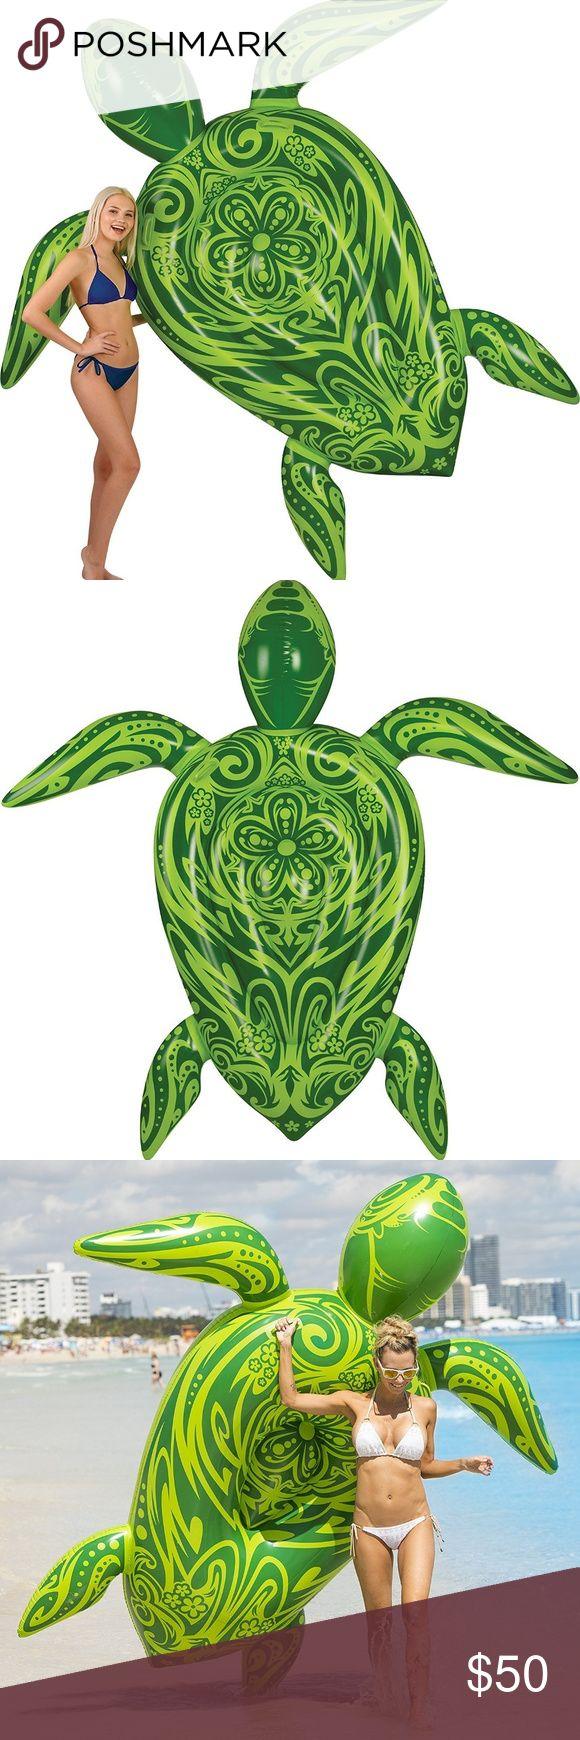 Gigantic Sea Turtle Pool Raft 8 Feet Brand new. Top summer inflatable pool toy f…